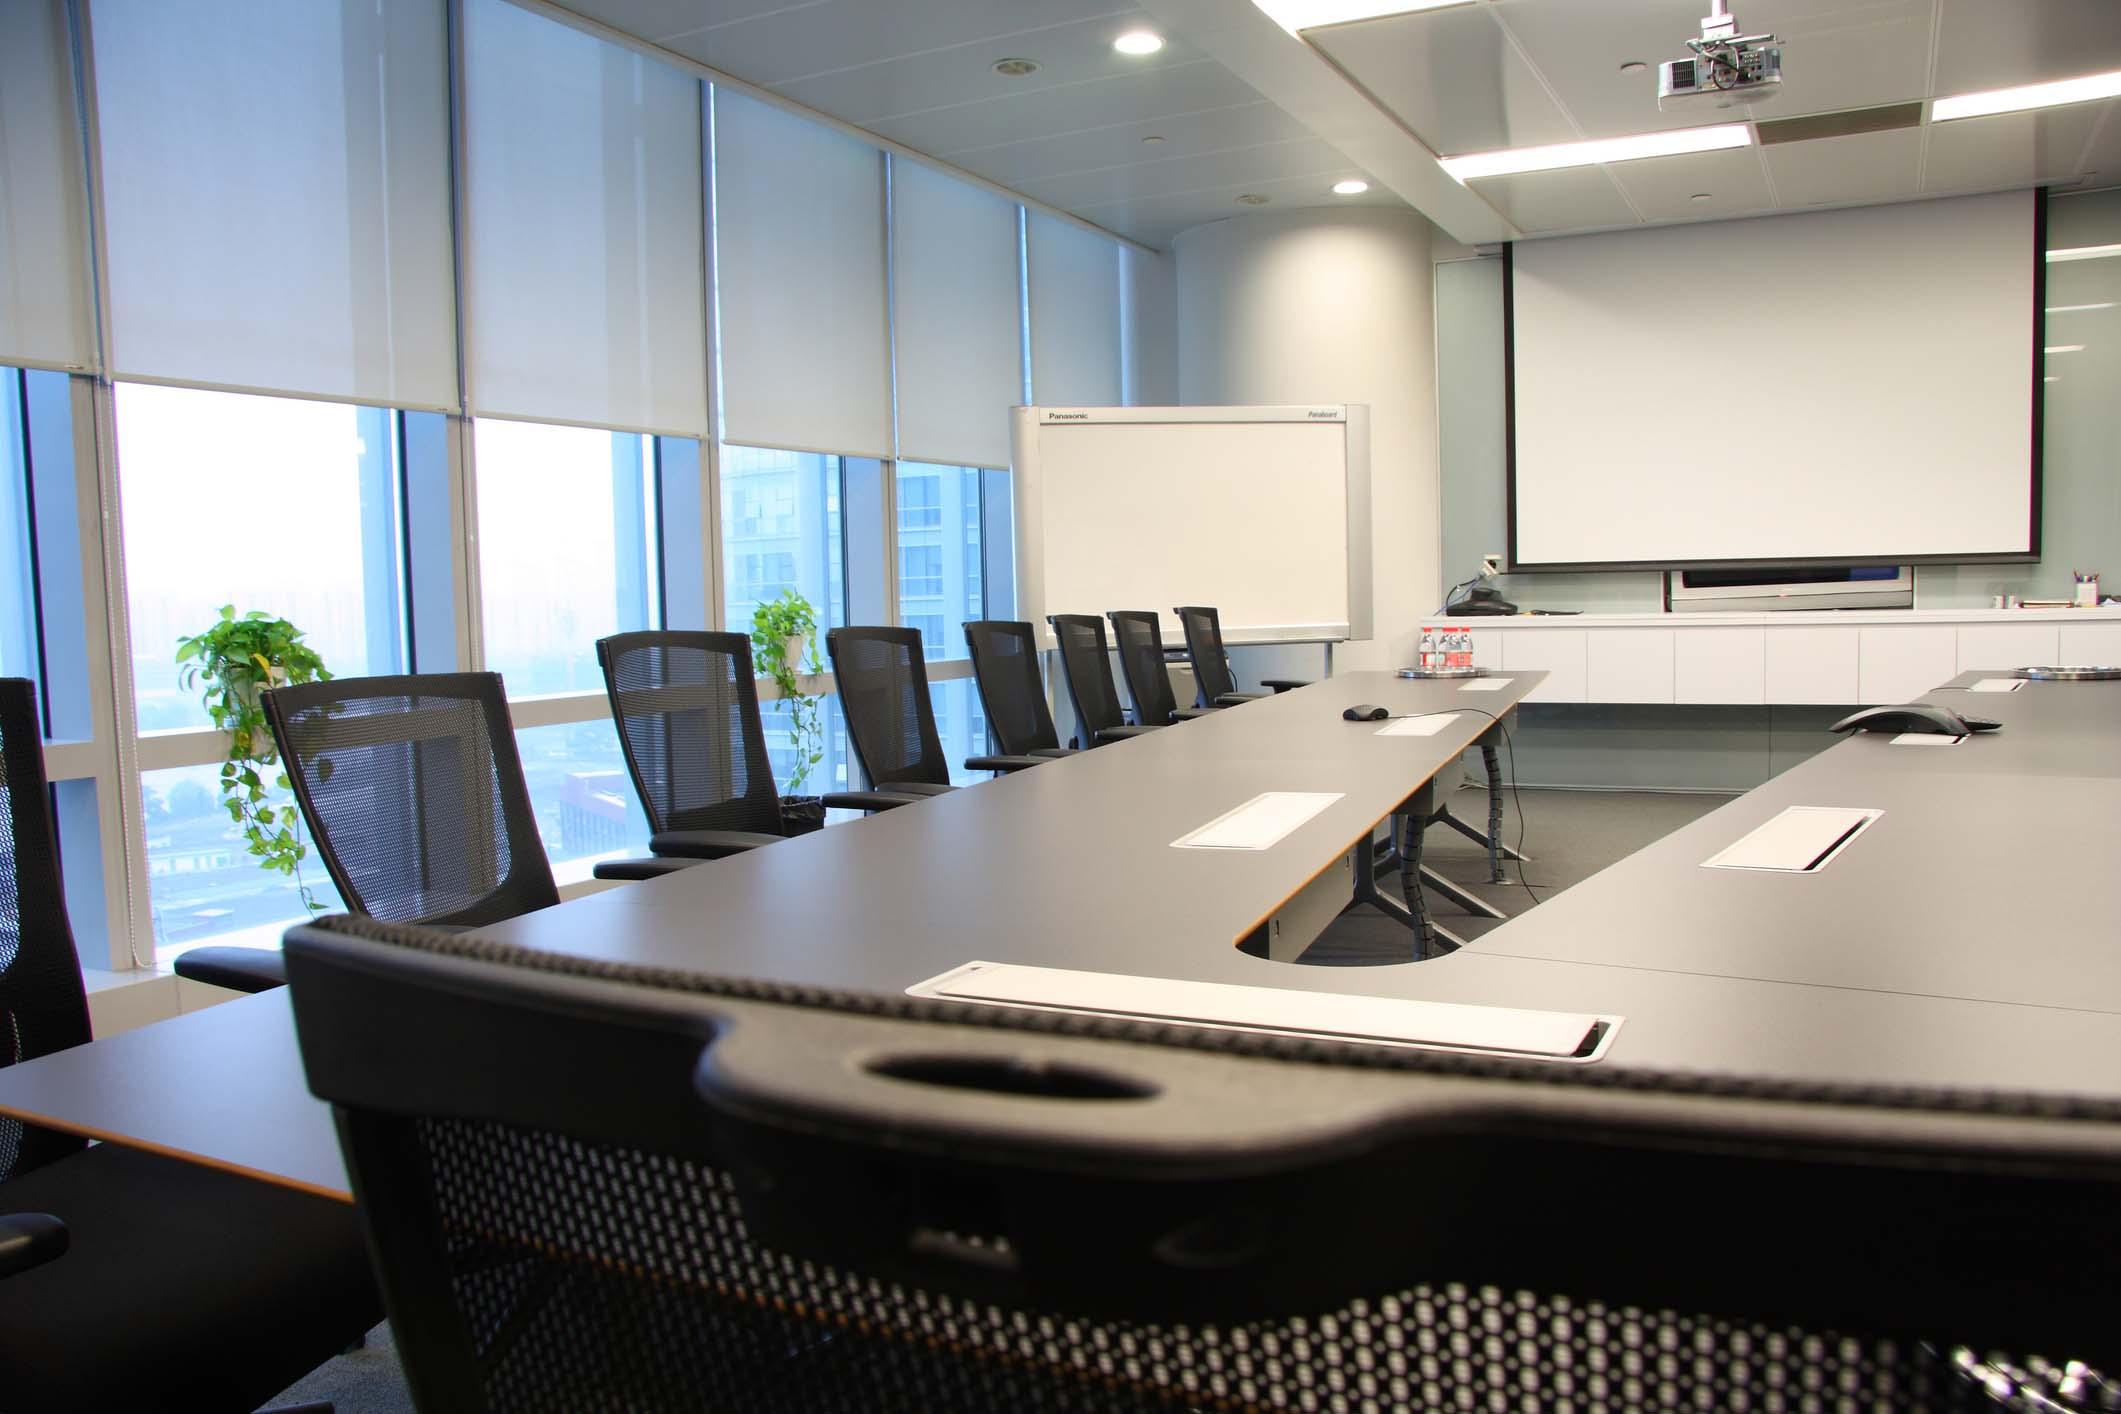 Meeting Room Projector Setup